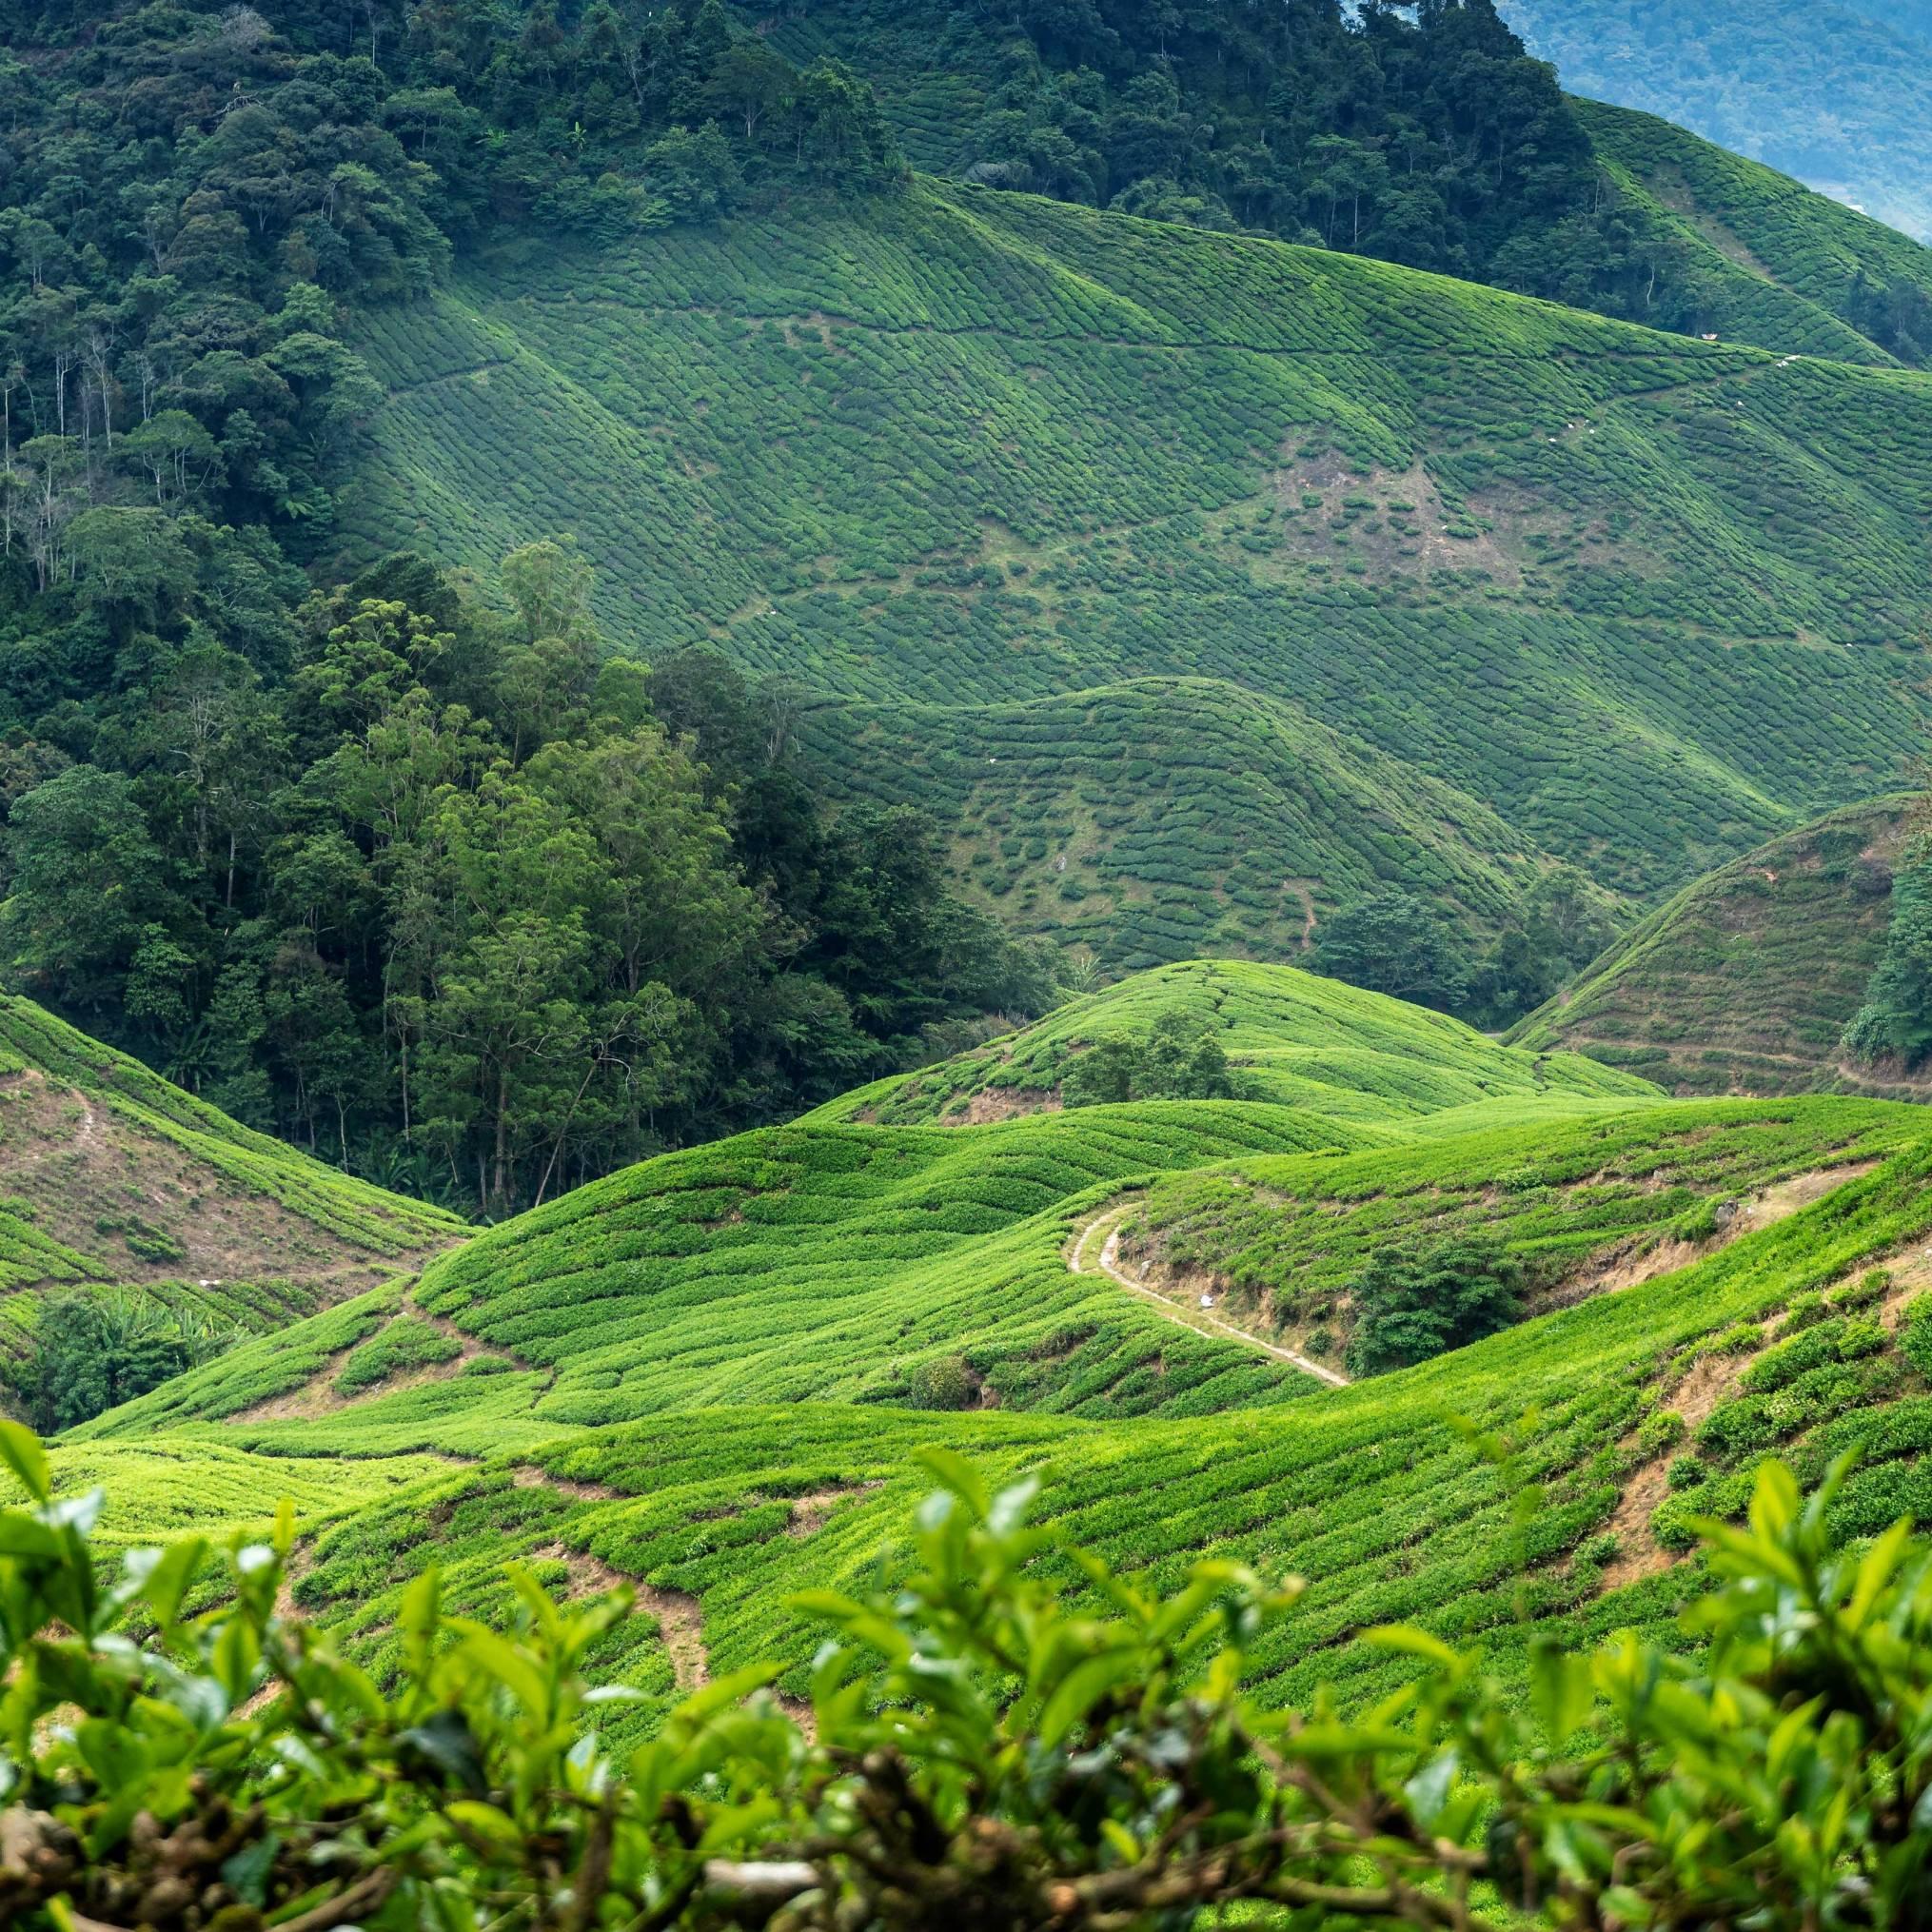 TEA PLANTATION, PAHANG